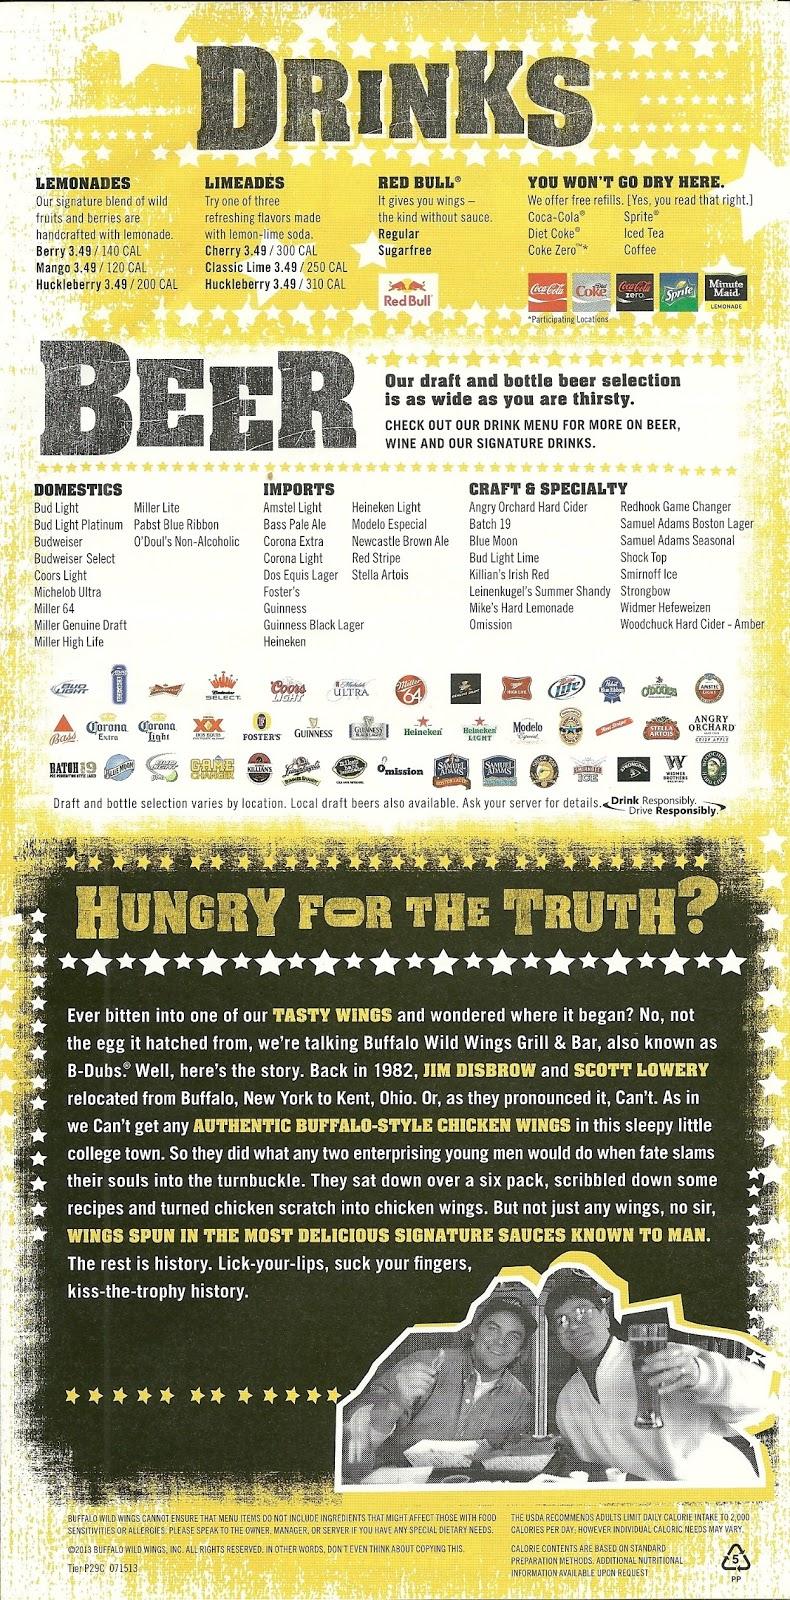 photo relating to Buffalo Wild Wings Printable Menu identified as Buffalo Wild Wings Beverage Menu Anti Feixista